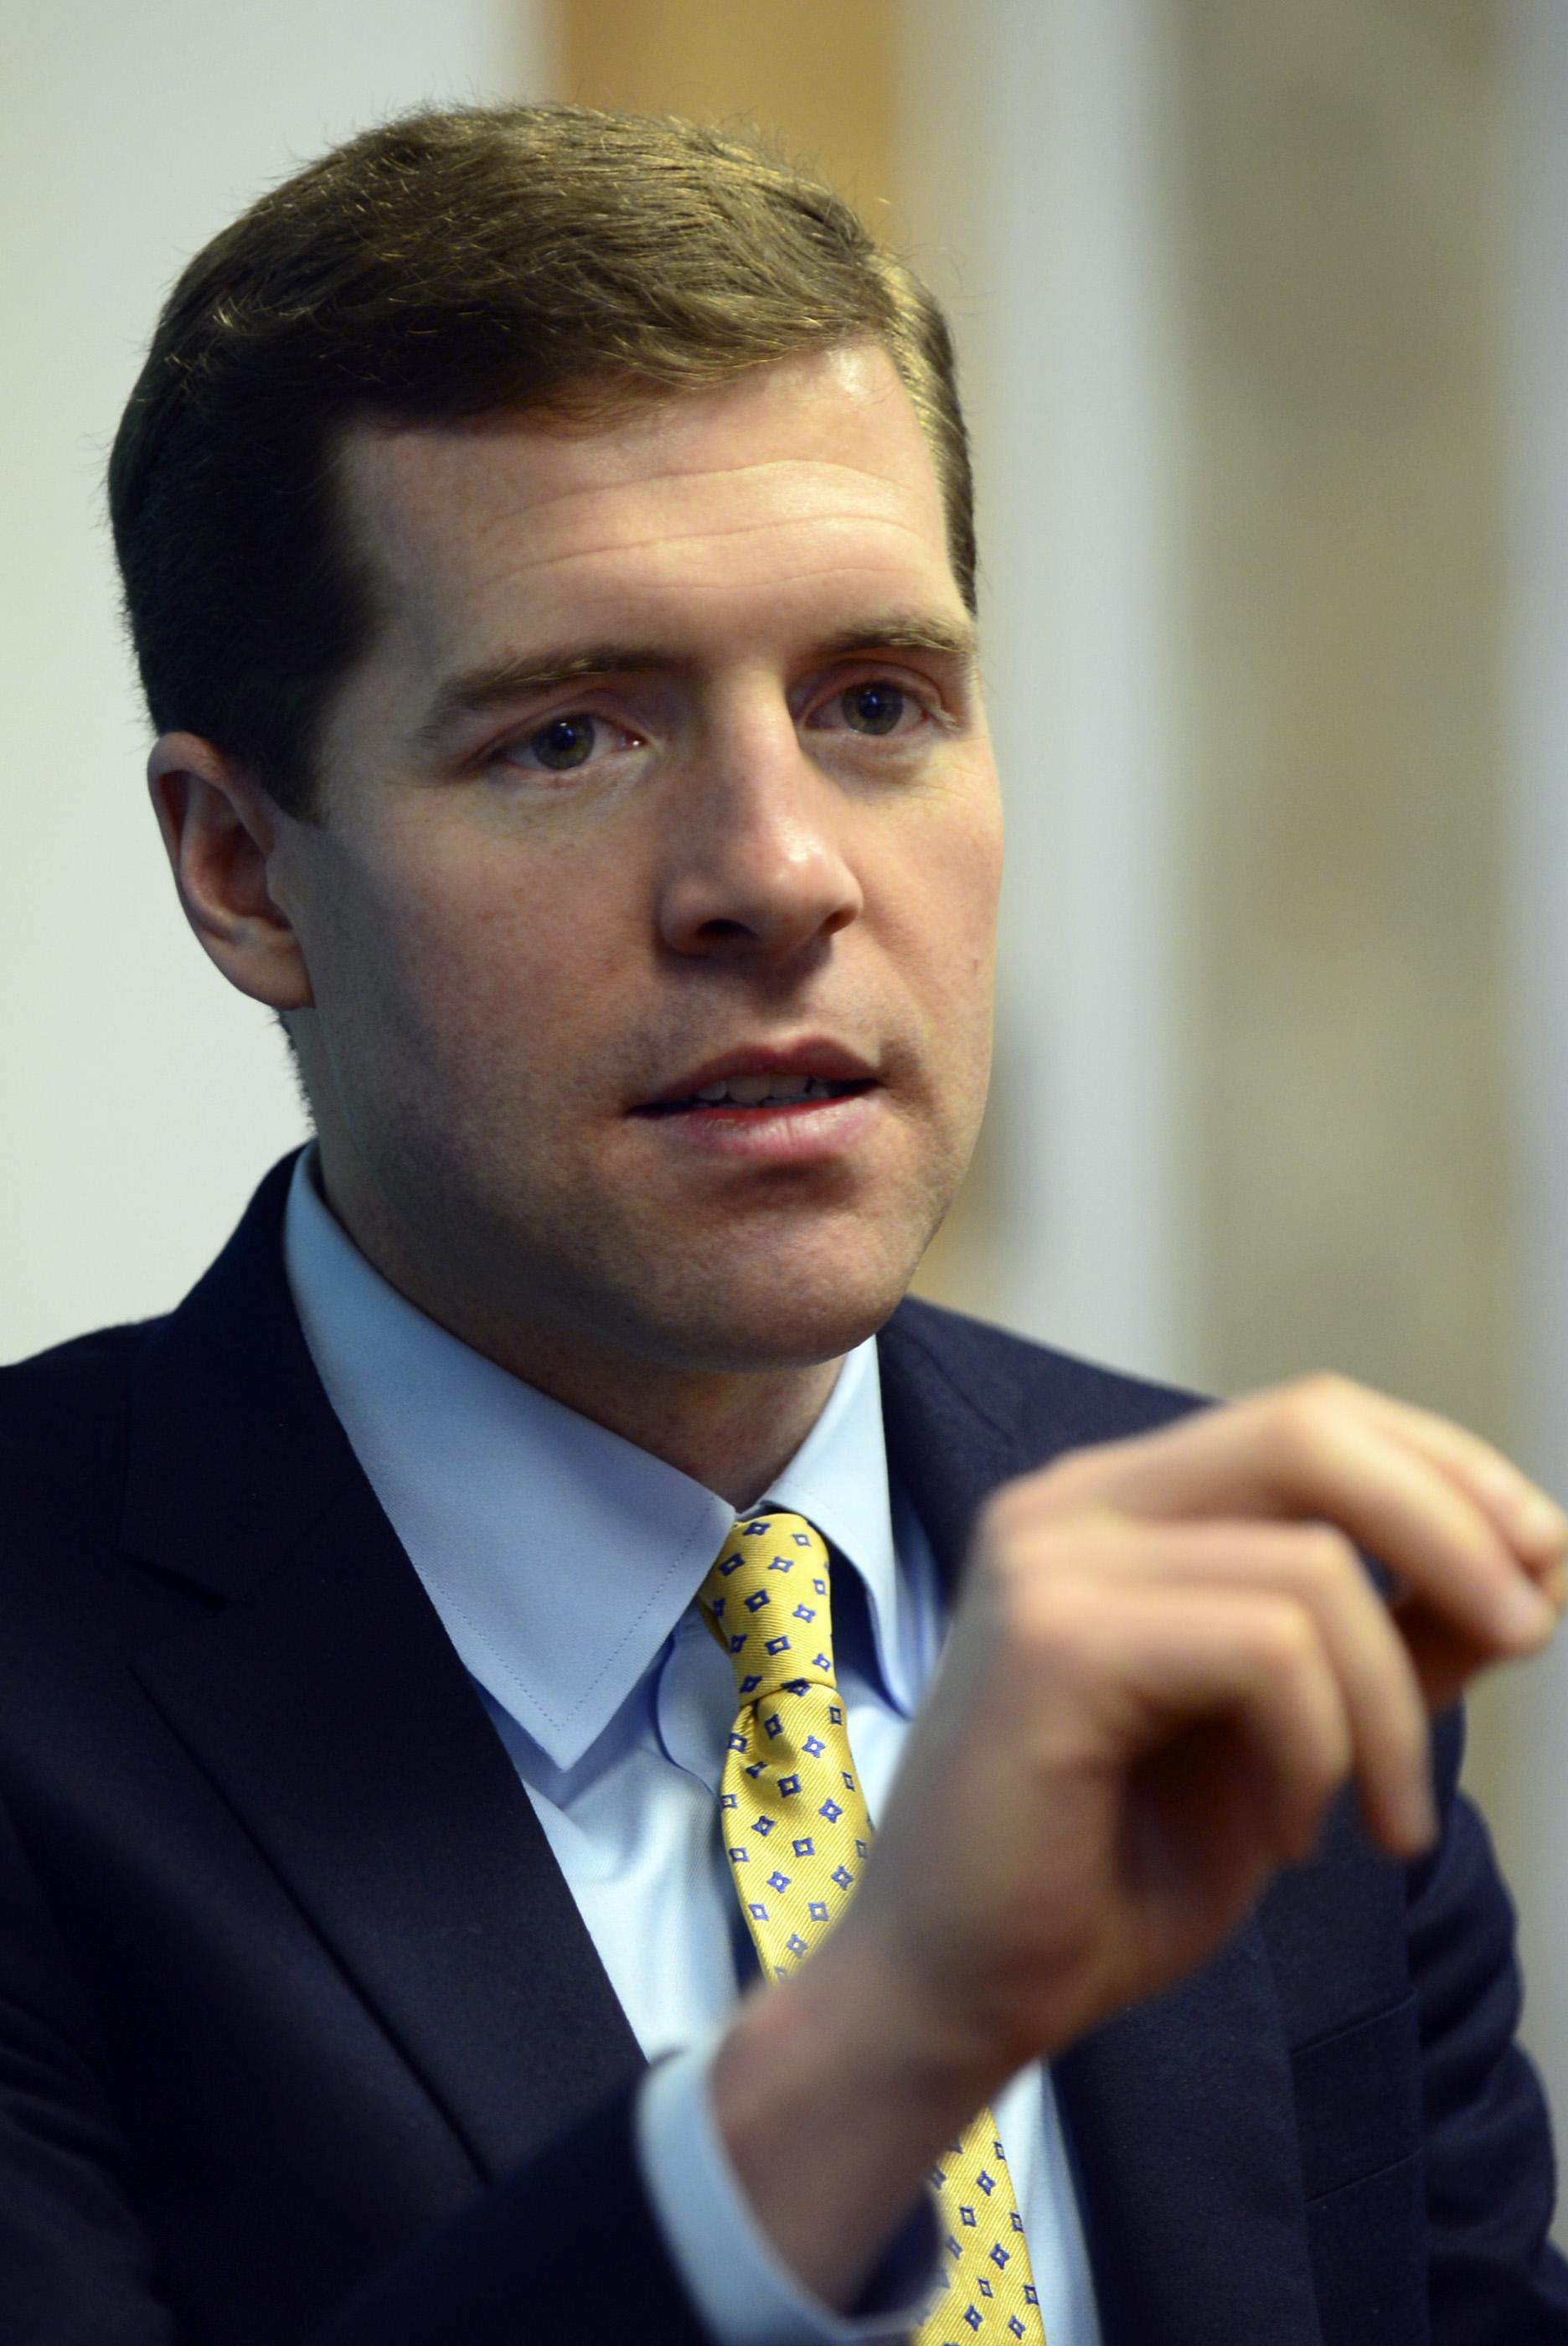 U.S. Rep. Conor Lamb of Allegheny County